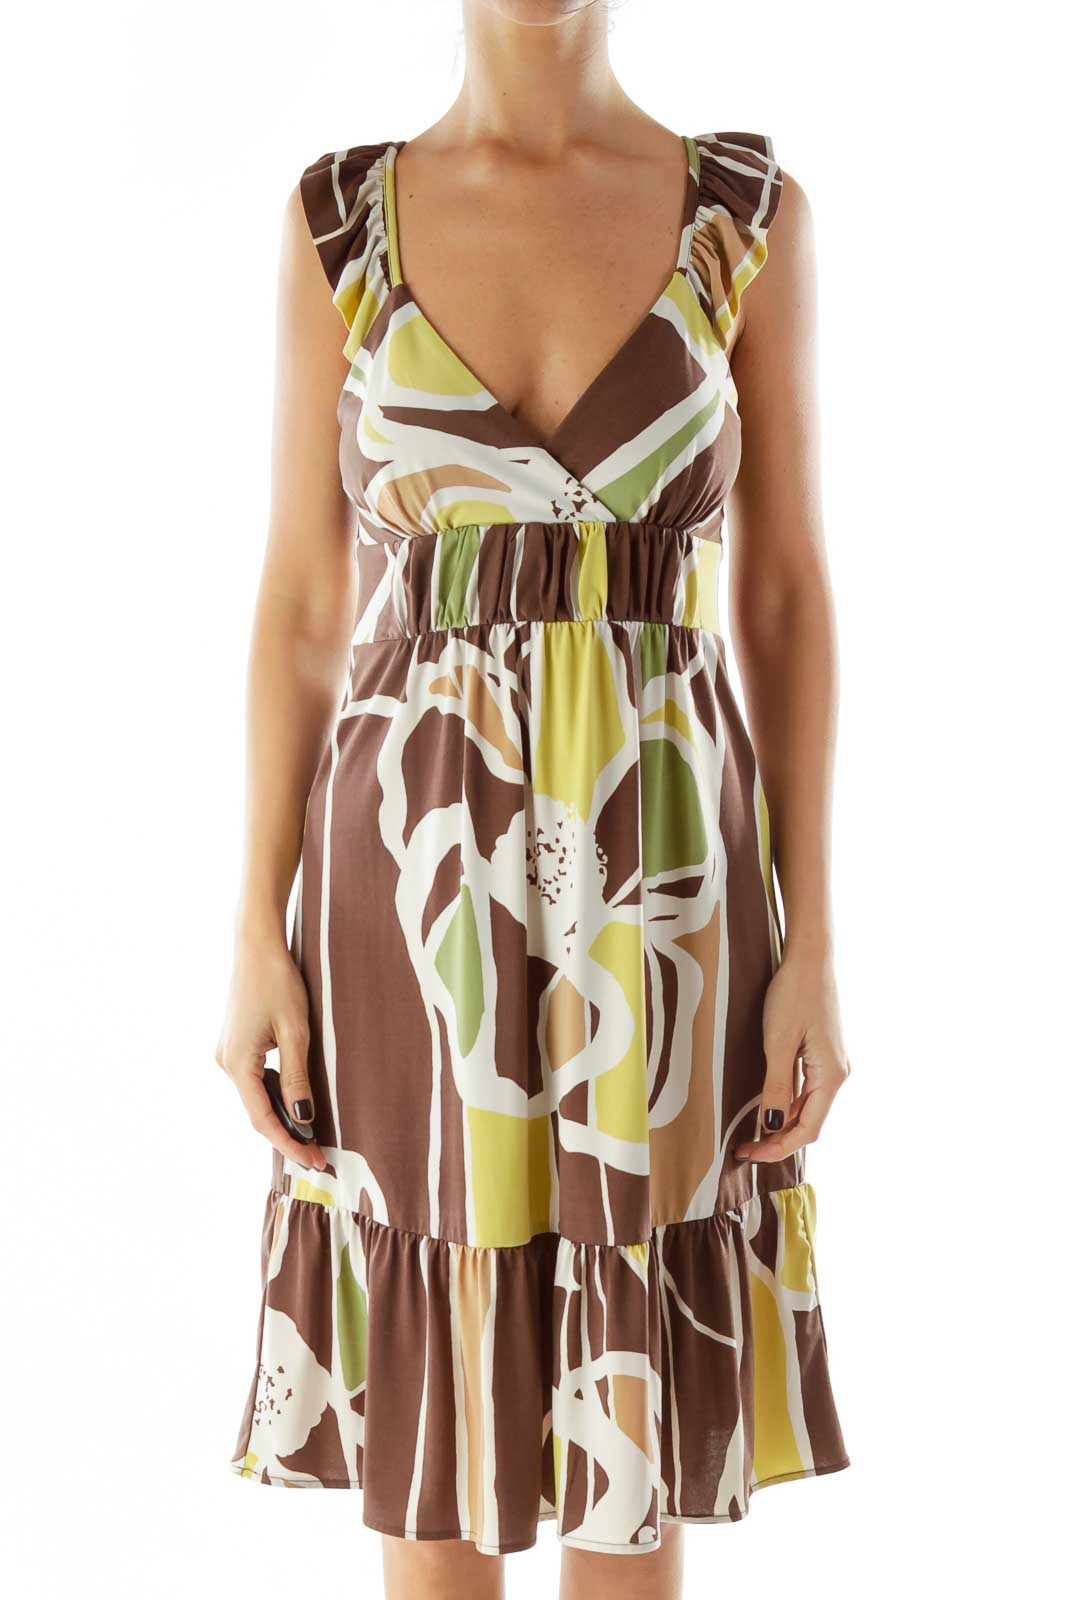 Brown Green Beige Ruffled Sleeveless Print Dress Front